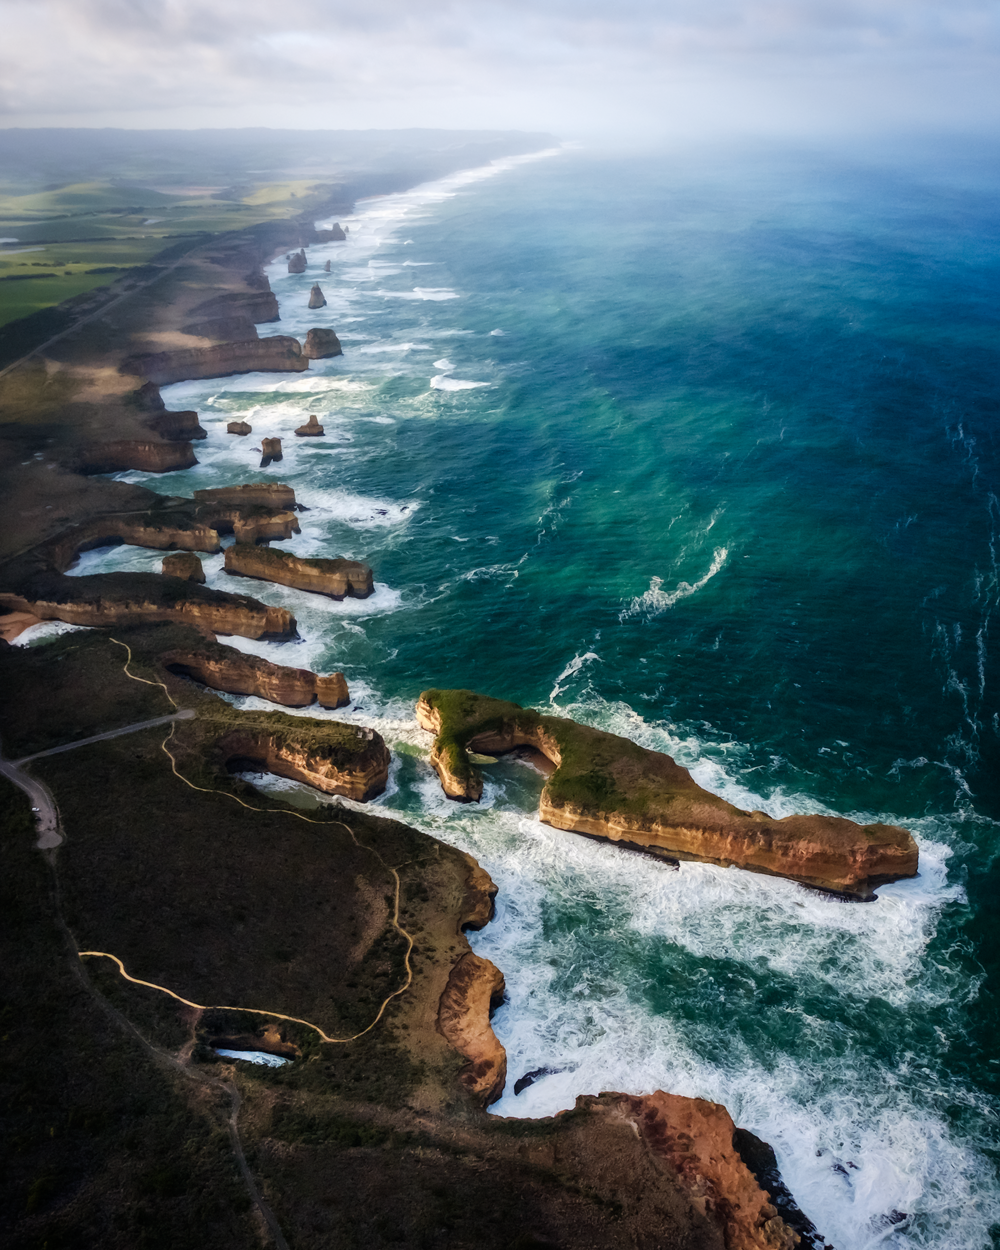 12-apostles-photography-workshop-great-ocean-road-03